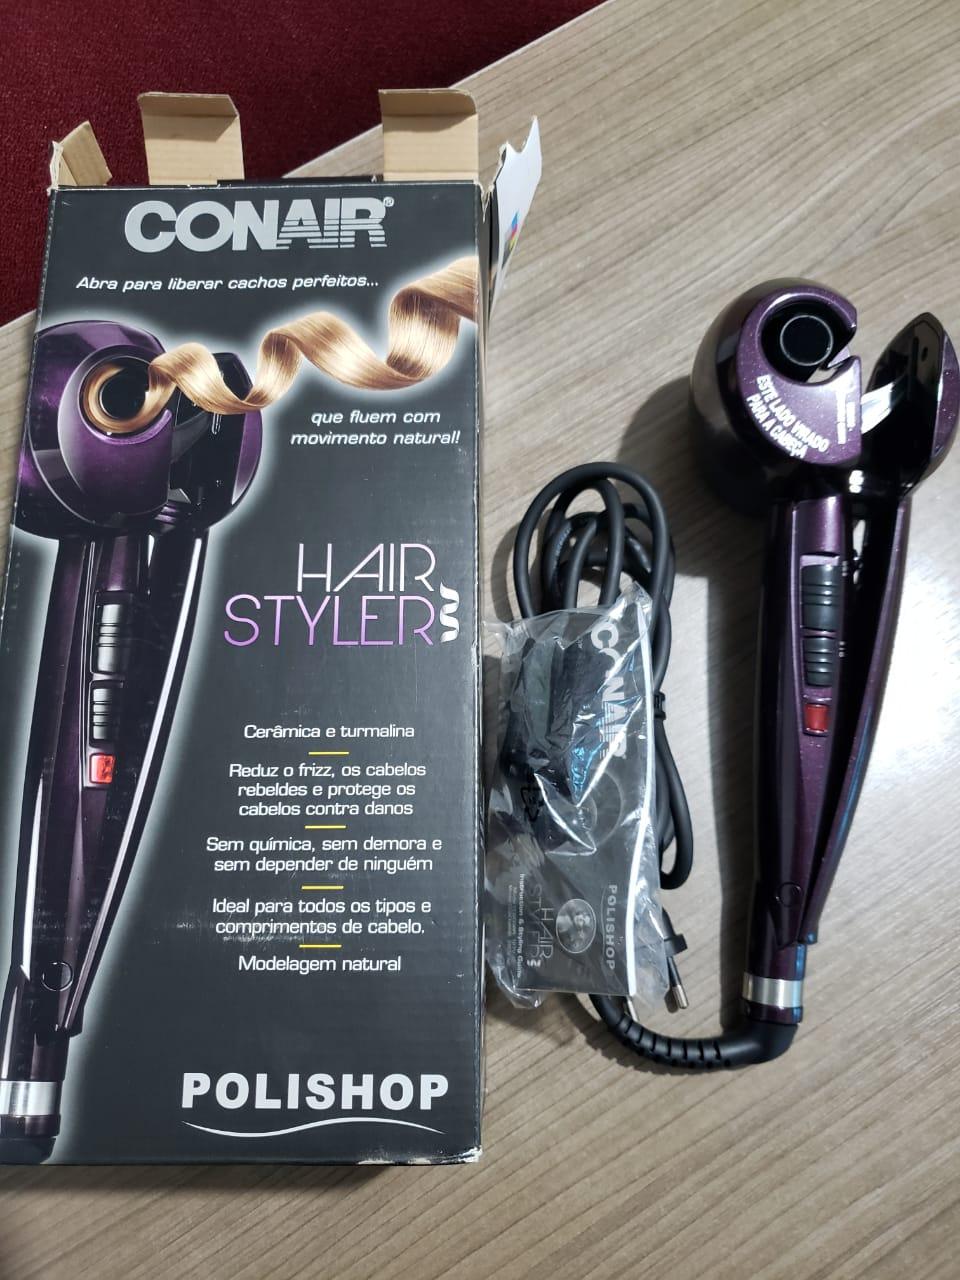 Vende-se Hair Styler (Polishop) modelador de cachos - original